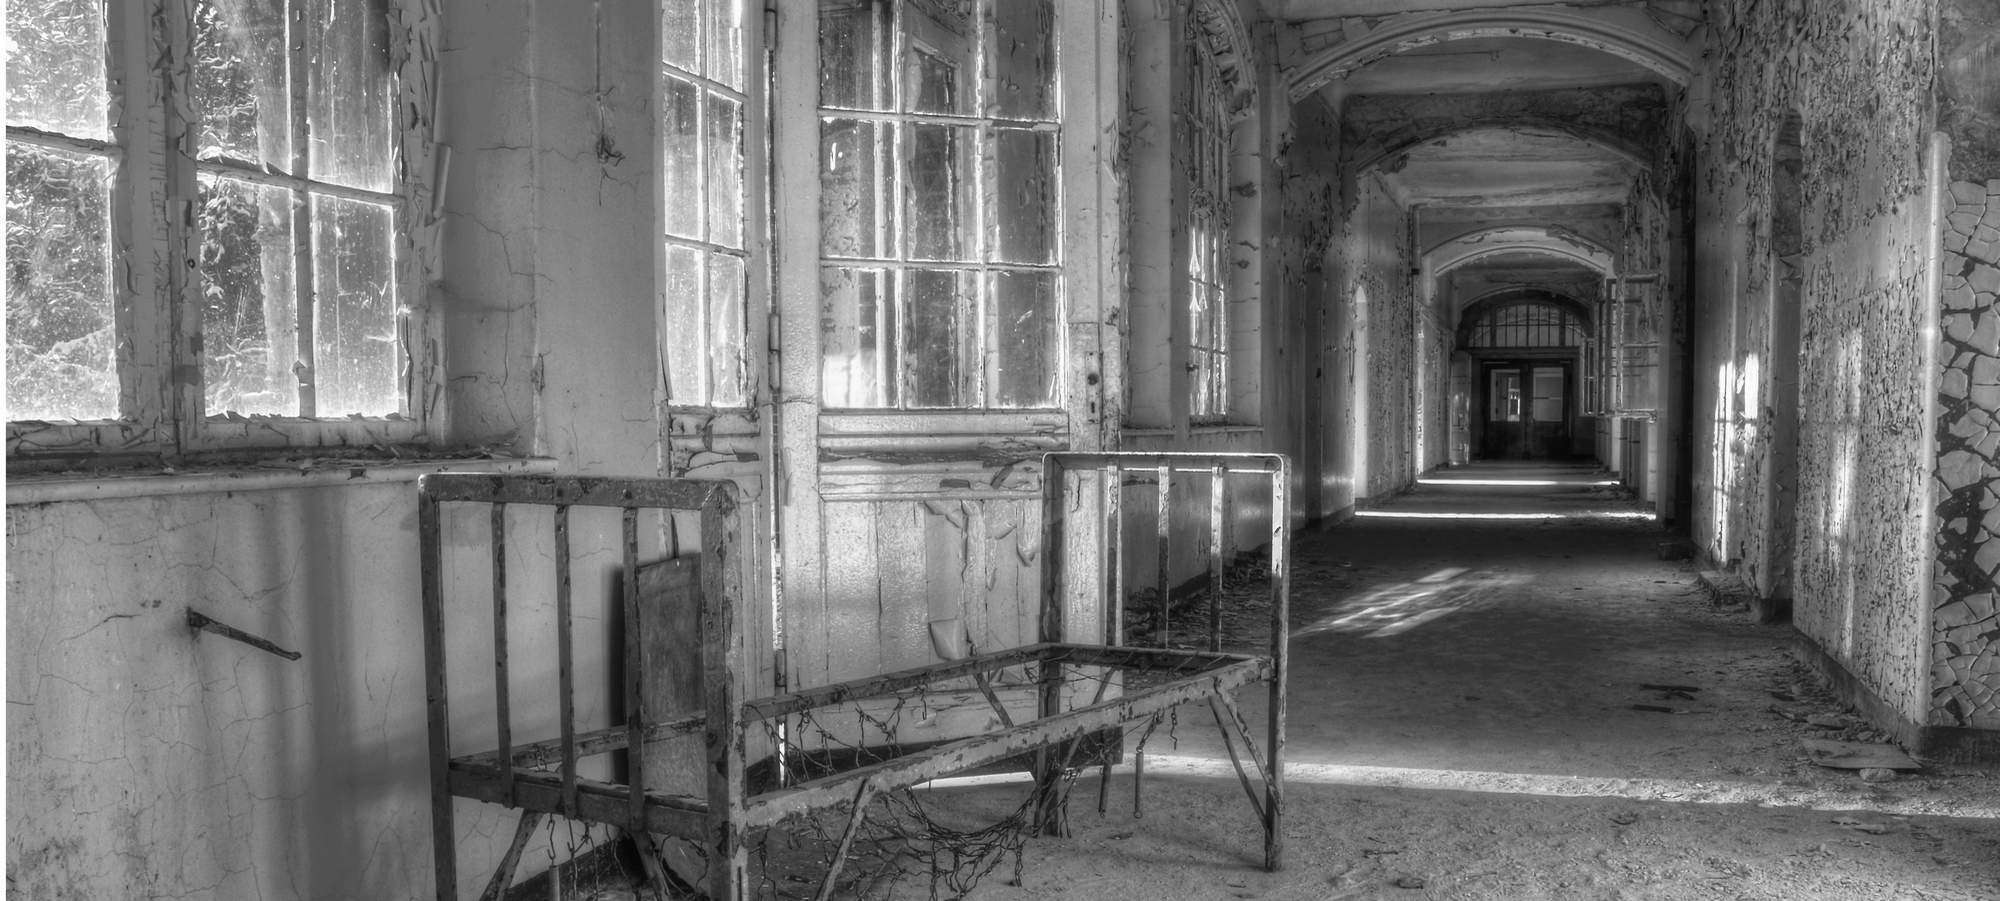 Dusk Till Dawn Events - Ghost Hunts